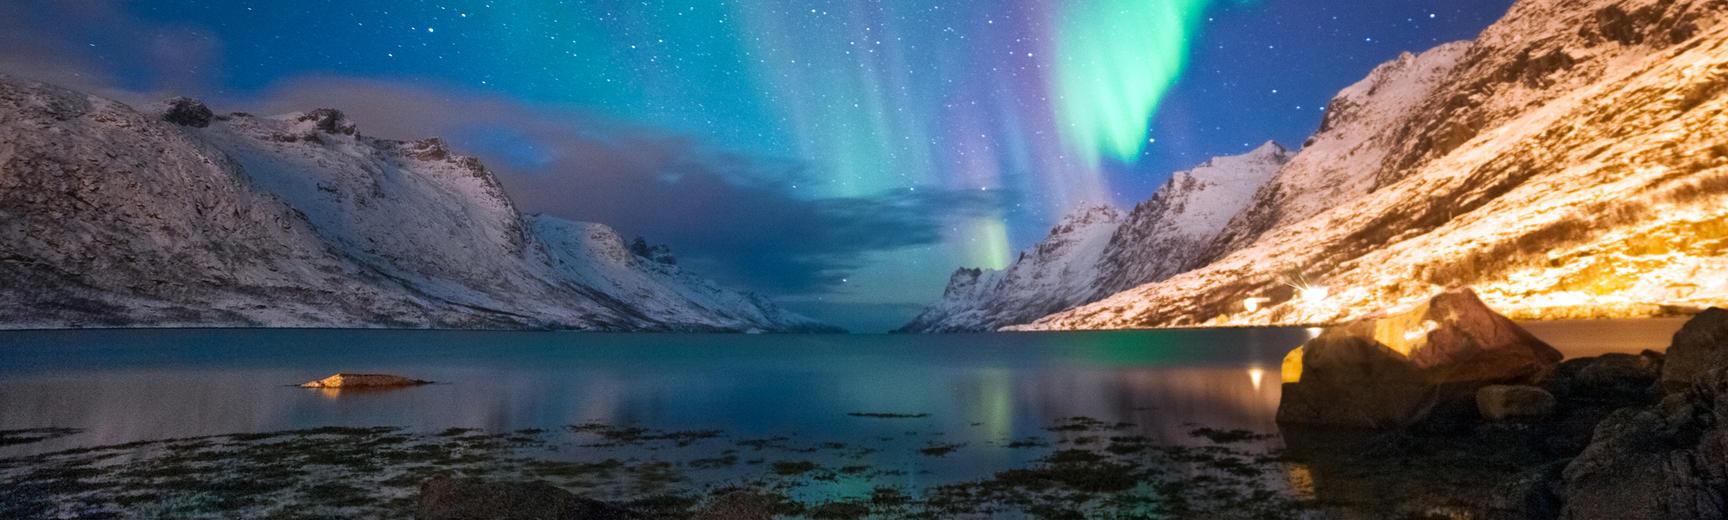 Aurora Borealis over the Norwegian coast